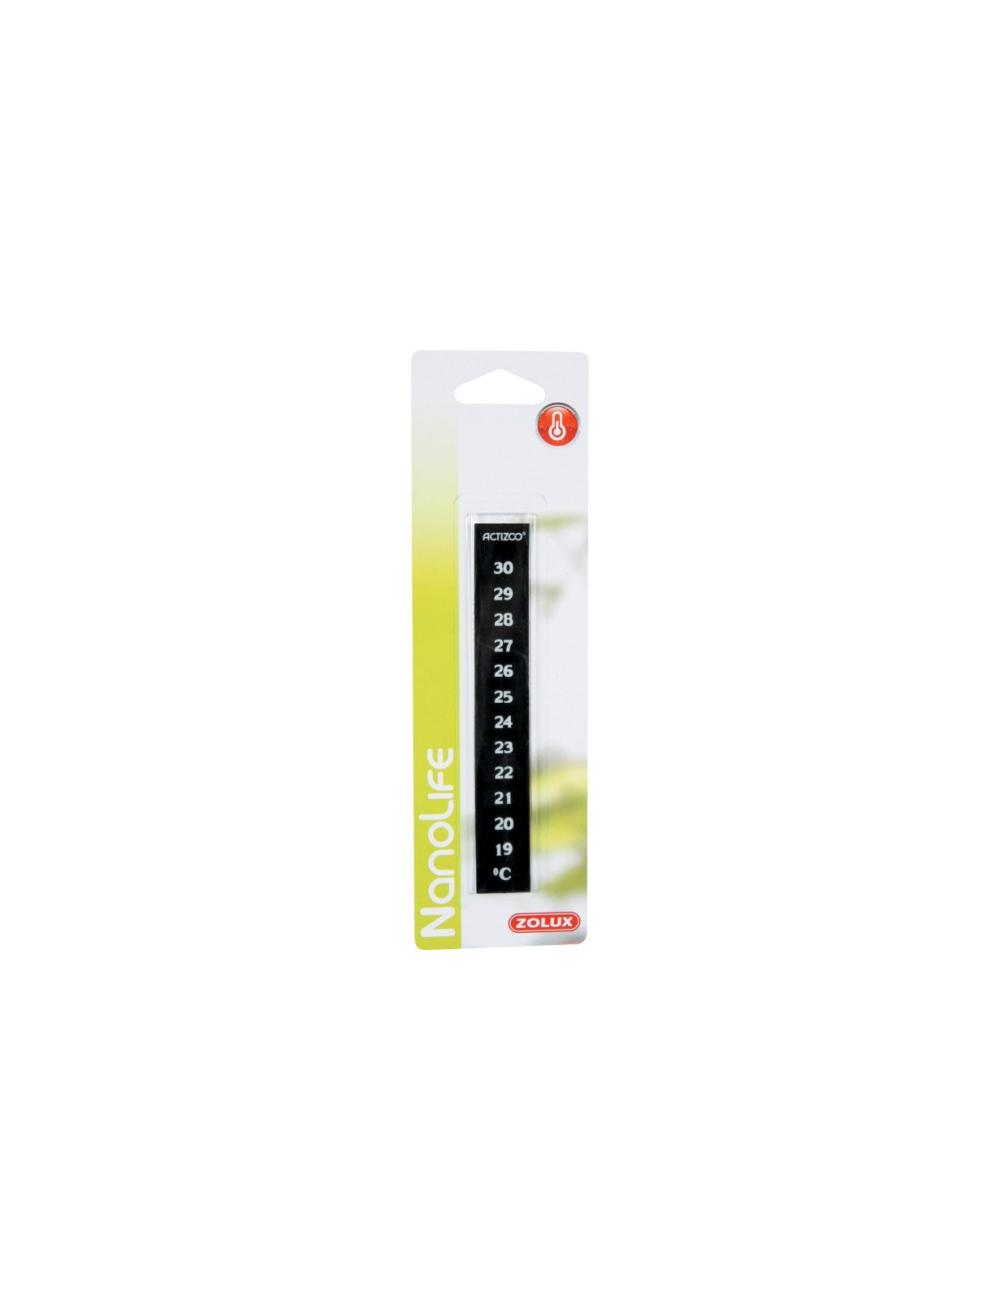 ZOLUX - Thermomètre digital à coller